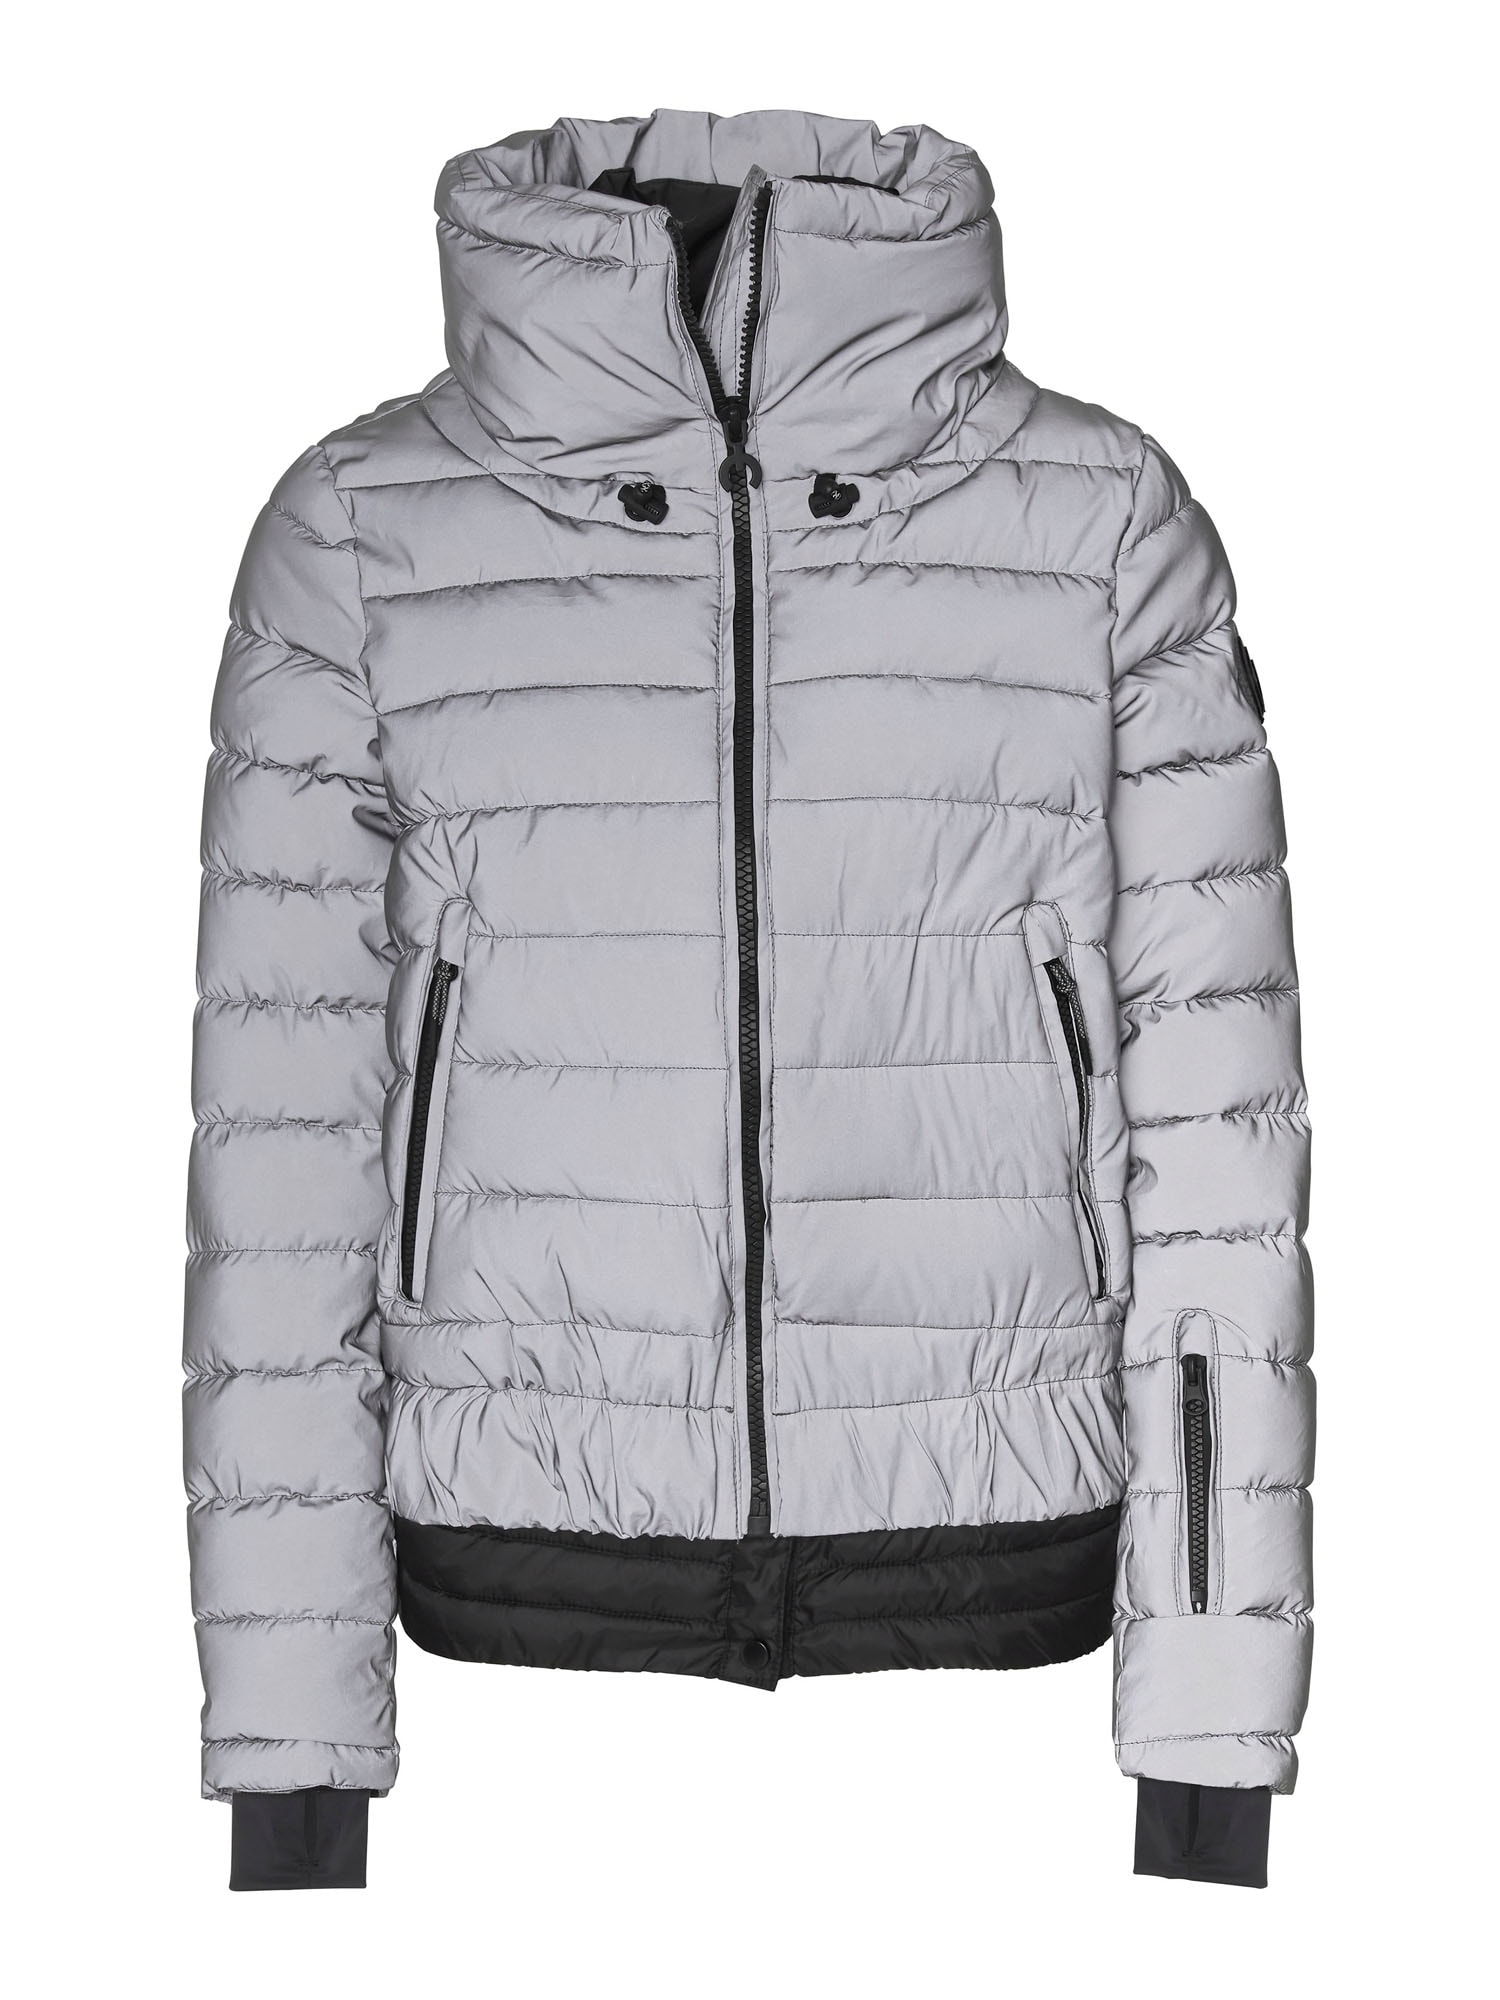 CHIEMSEE Outdoorová bunda 'Siguang'  stříbrná